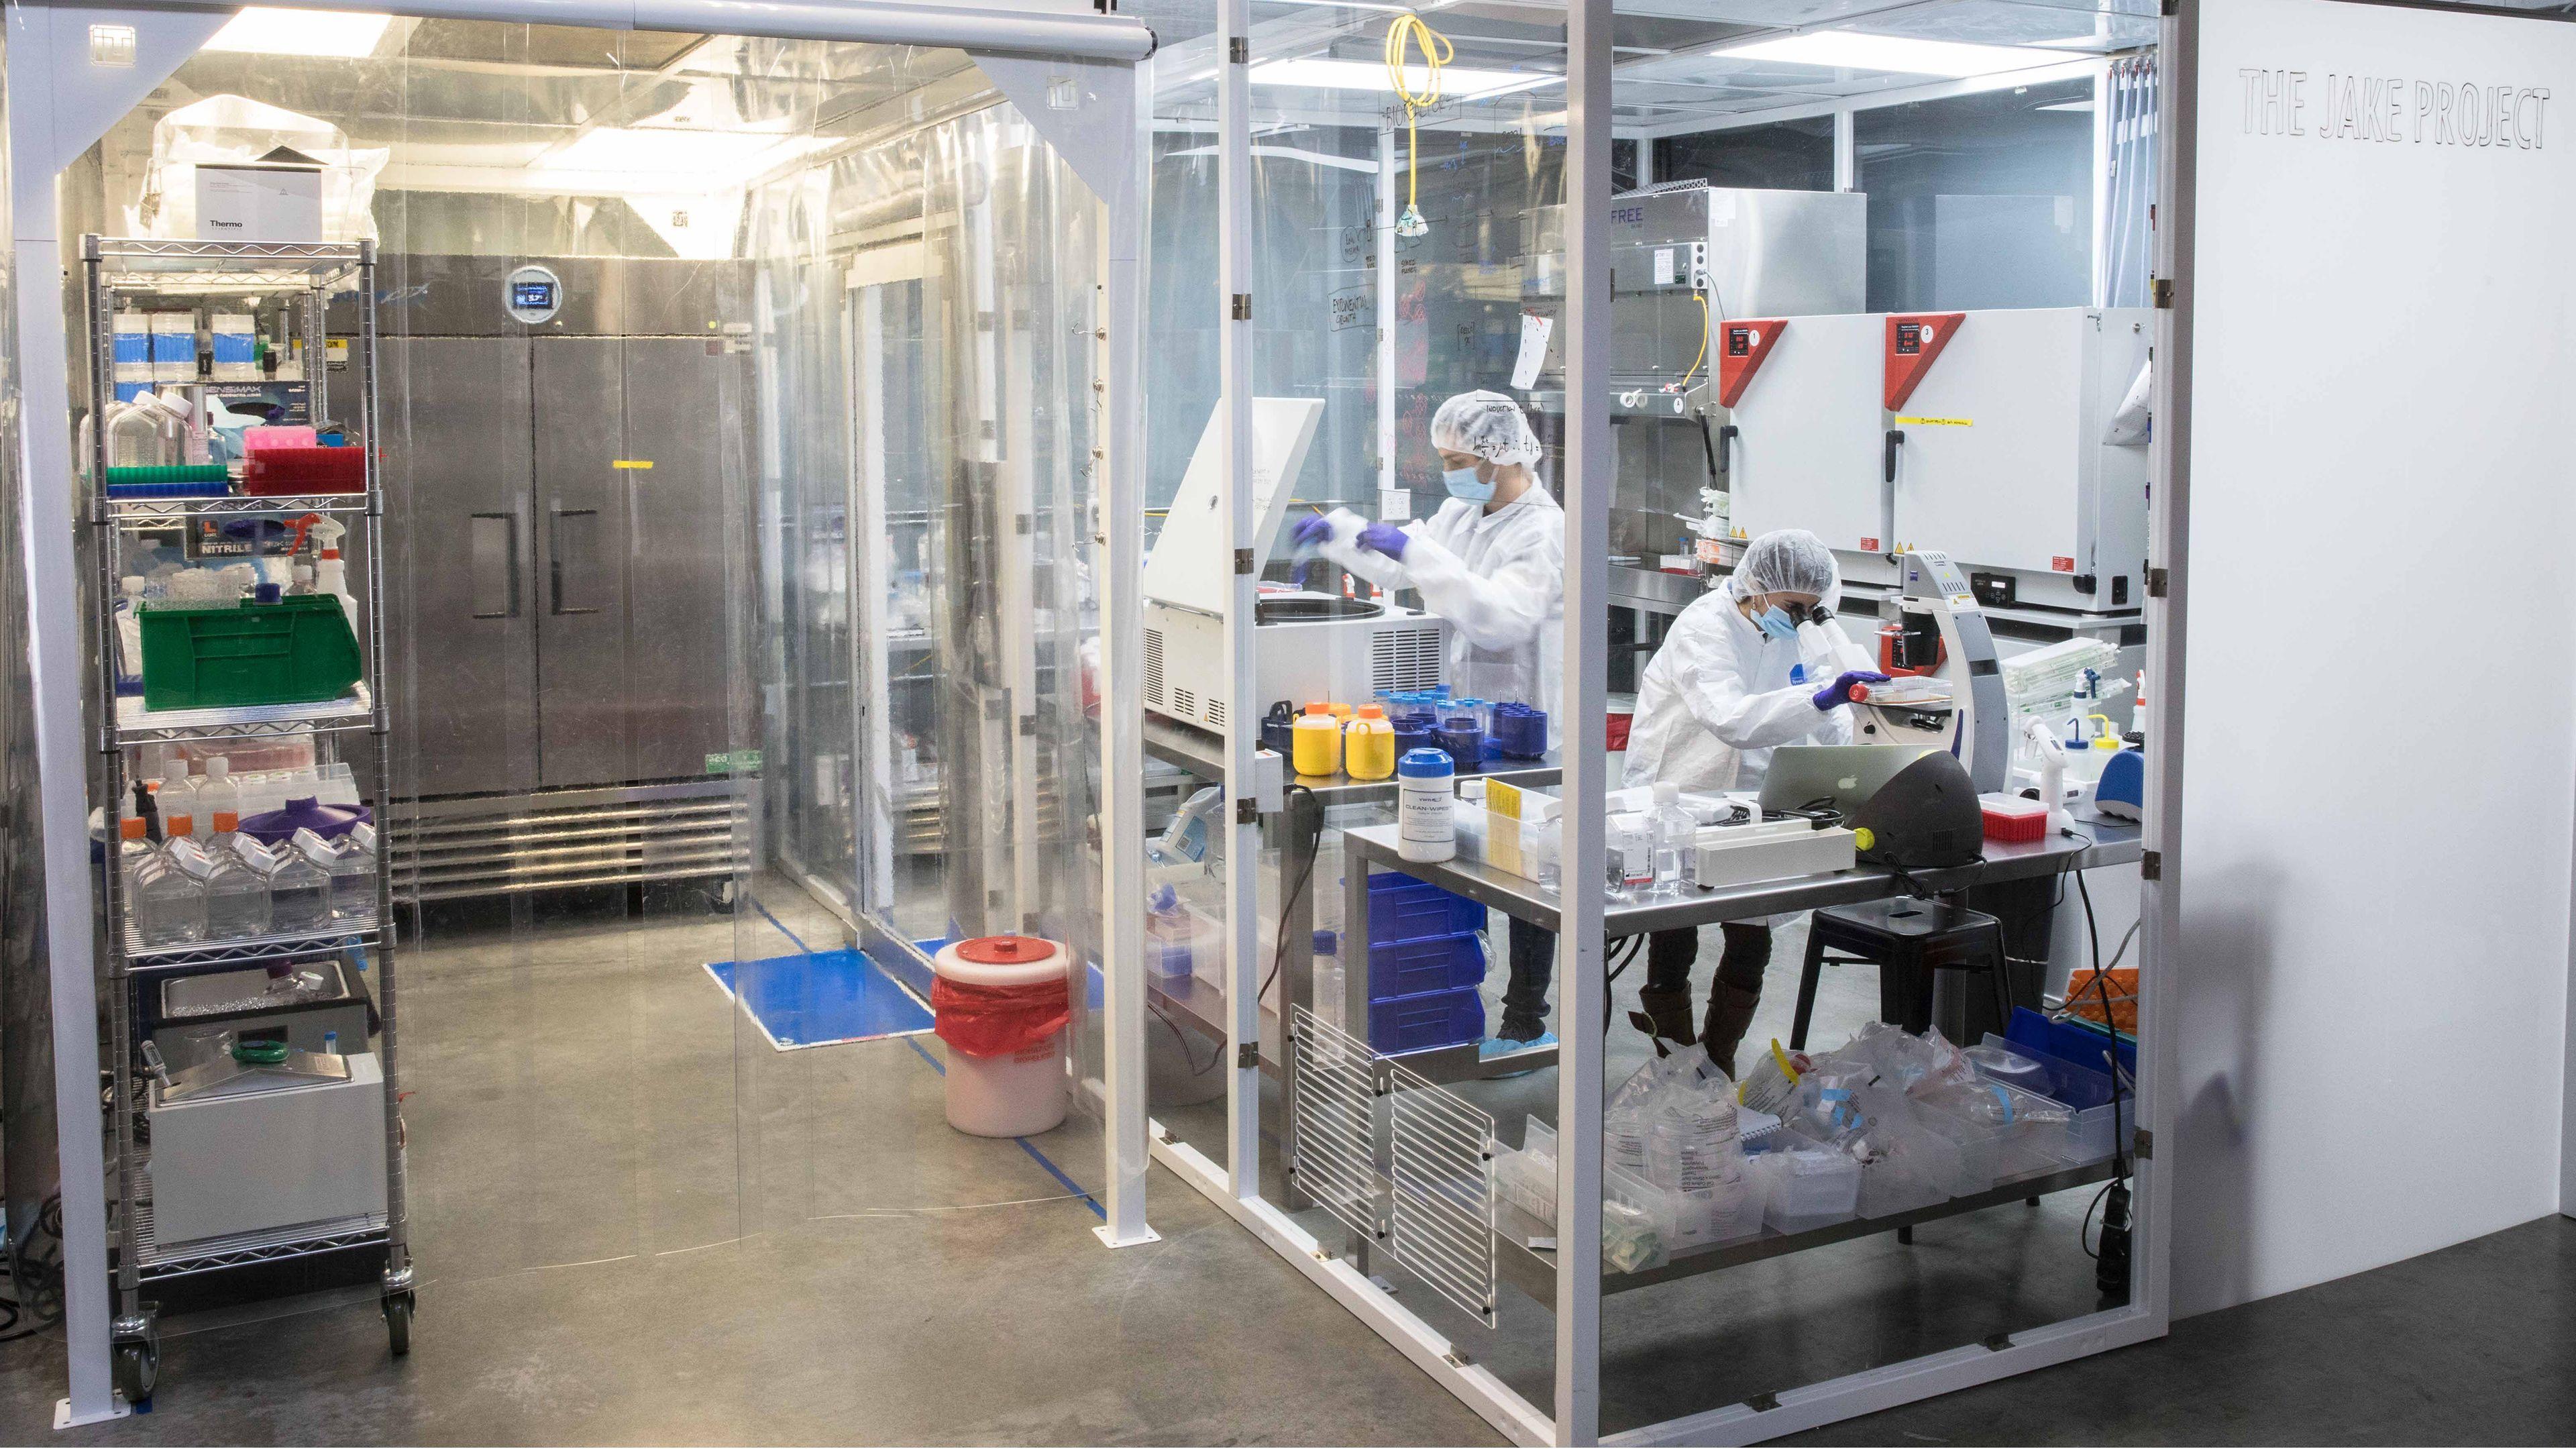 bioreactor cultured meat Google Search Locker storage